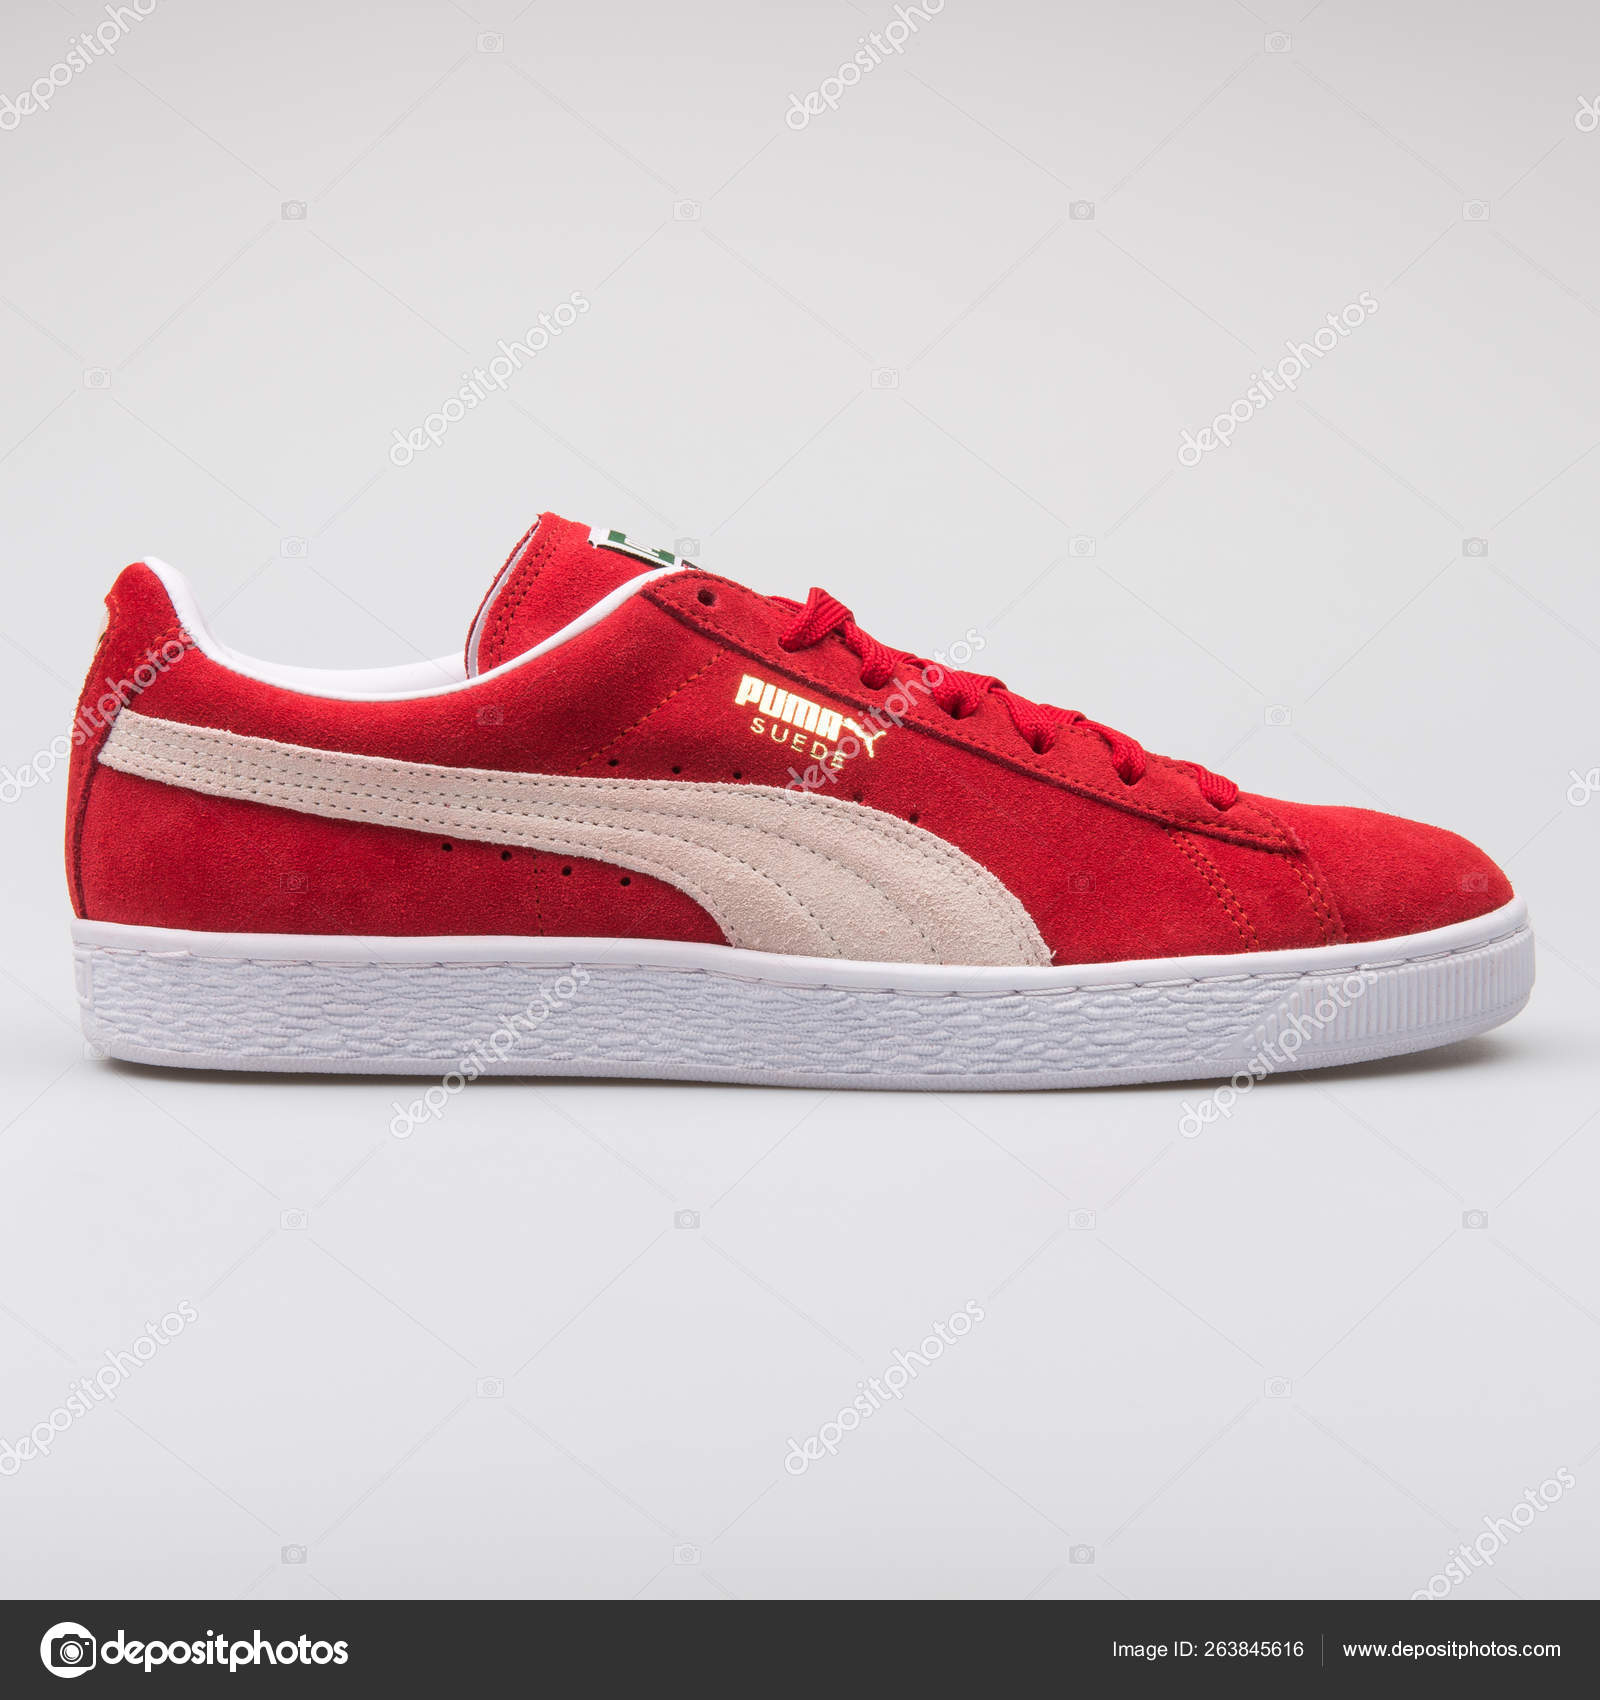 Puma Suede Classic red sneaker – Stock